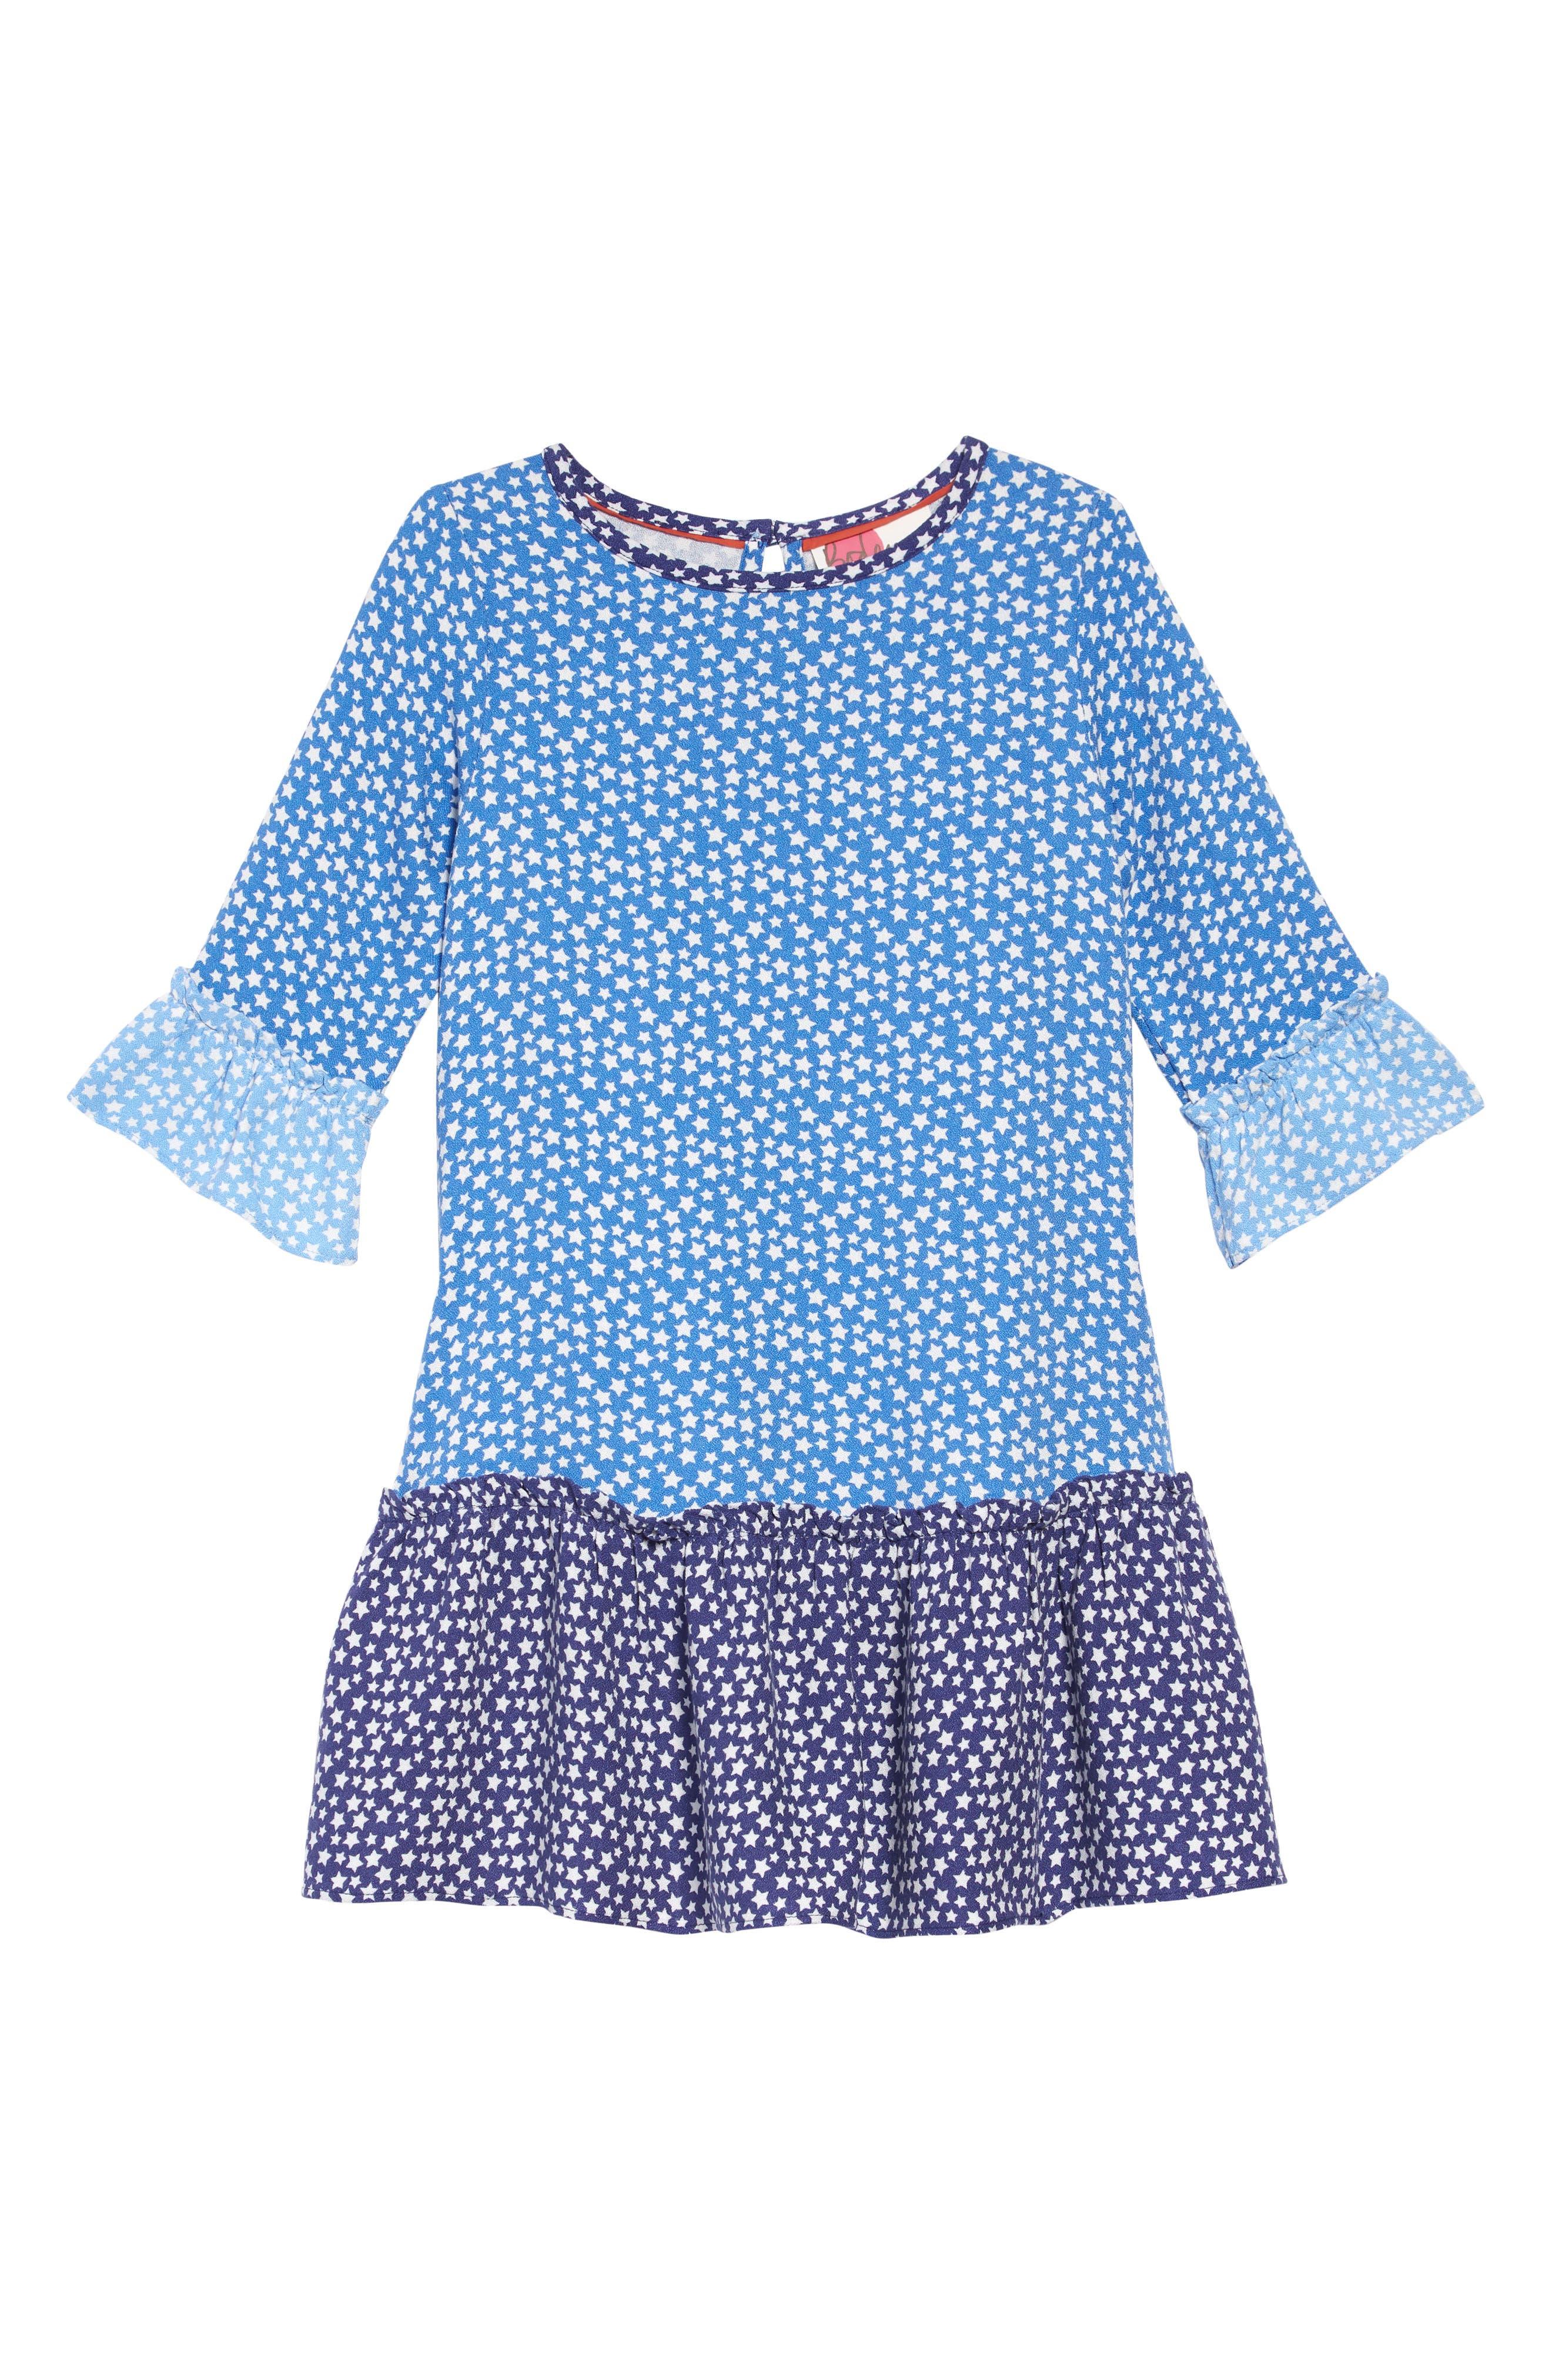 16368c5c4eb7bf Mini Boden Kids  Clothing